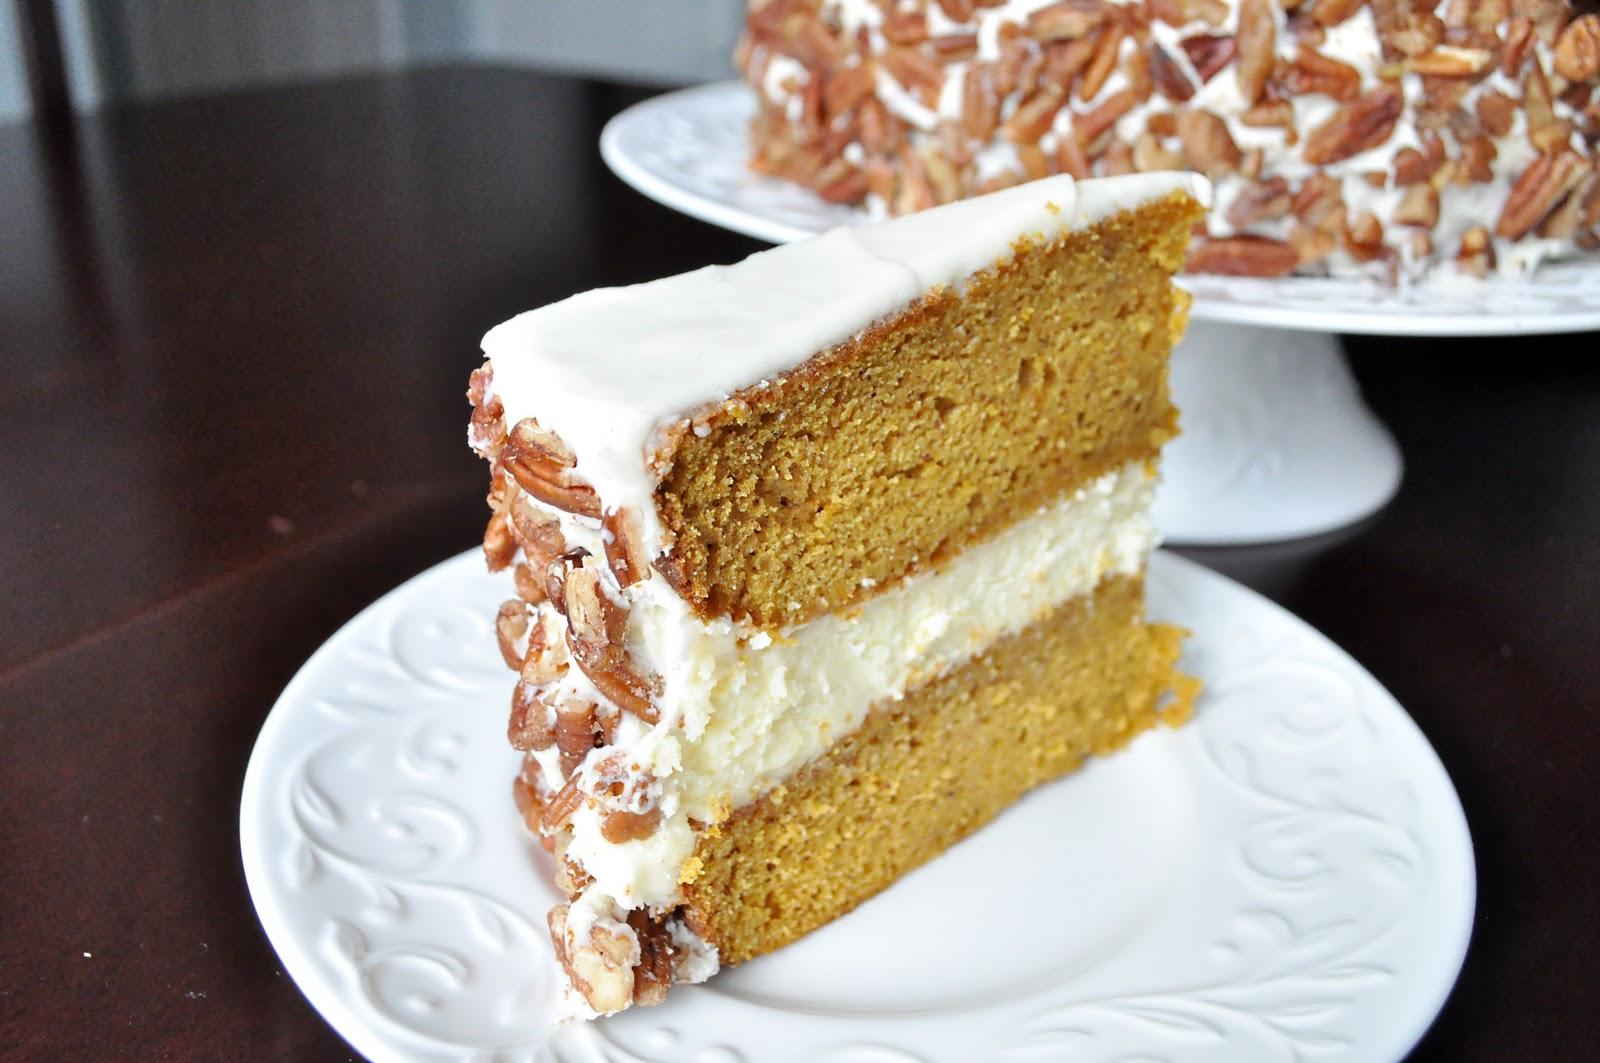 cheesecake pumpkin carrot cake cheesecake pumpkin cheesecake cake ...